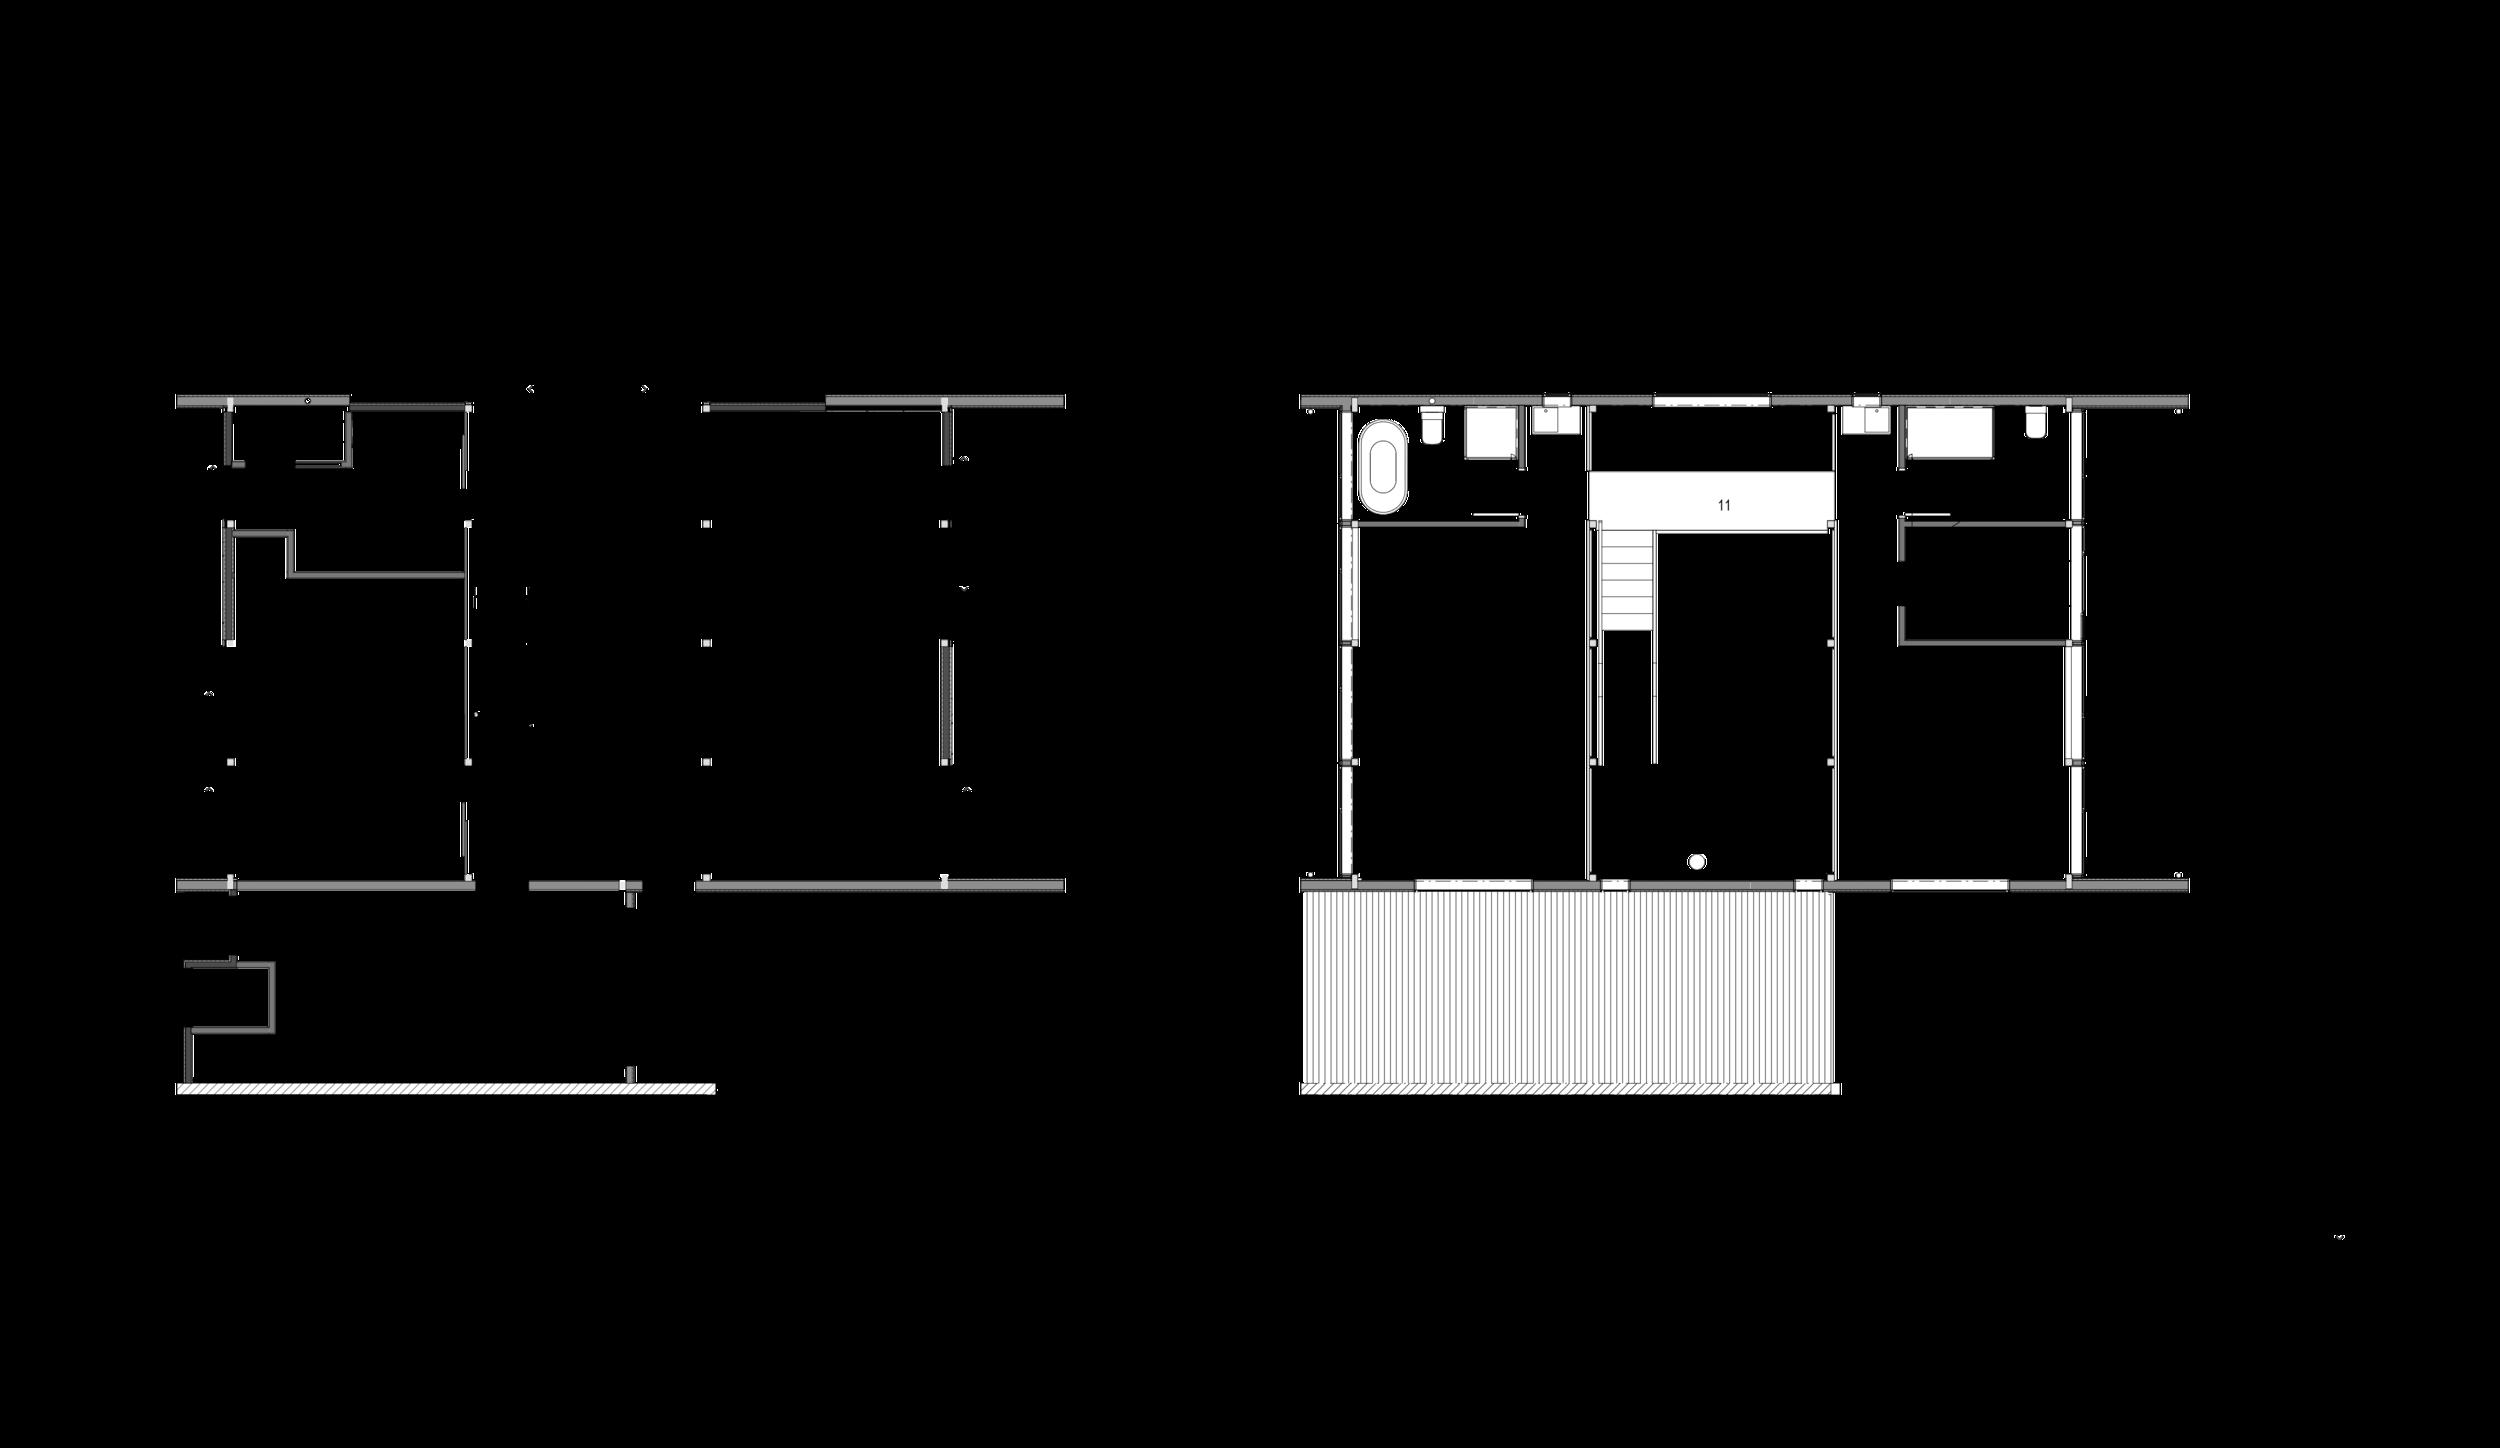 modhouse floor plan